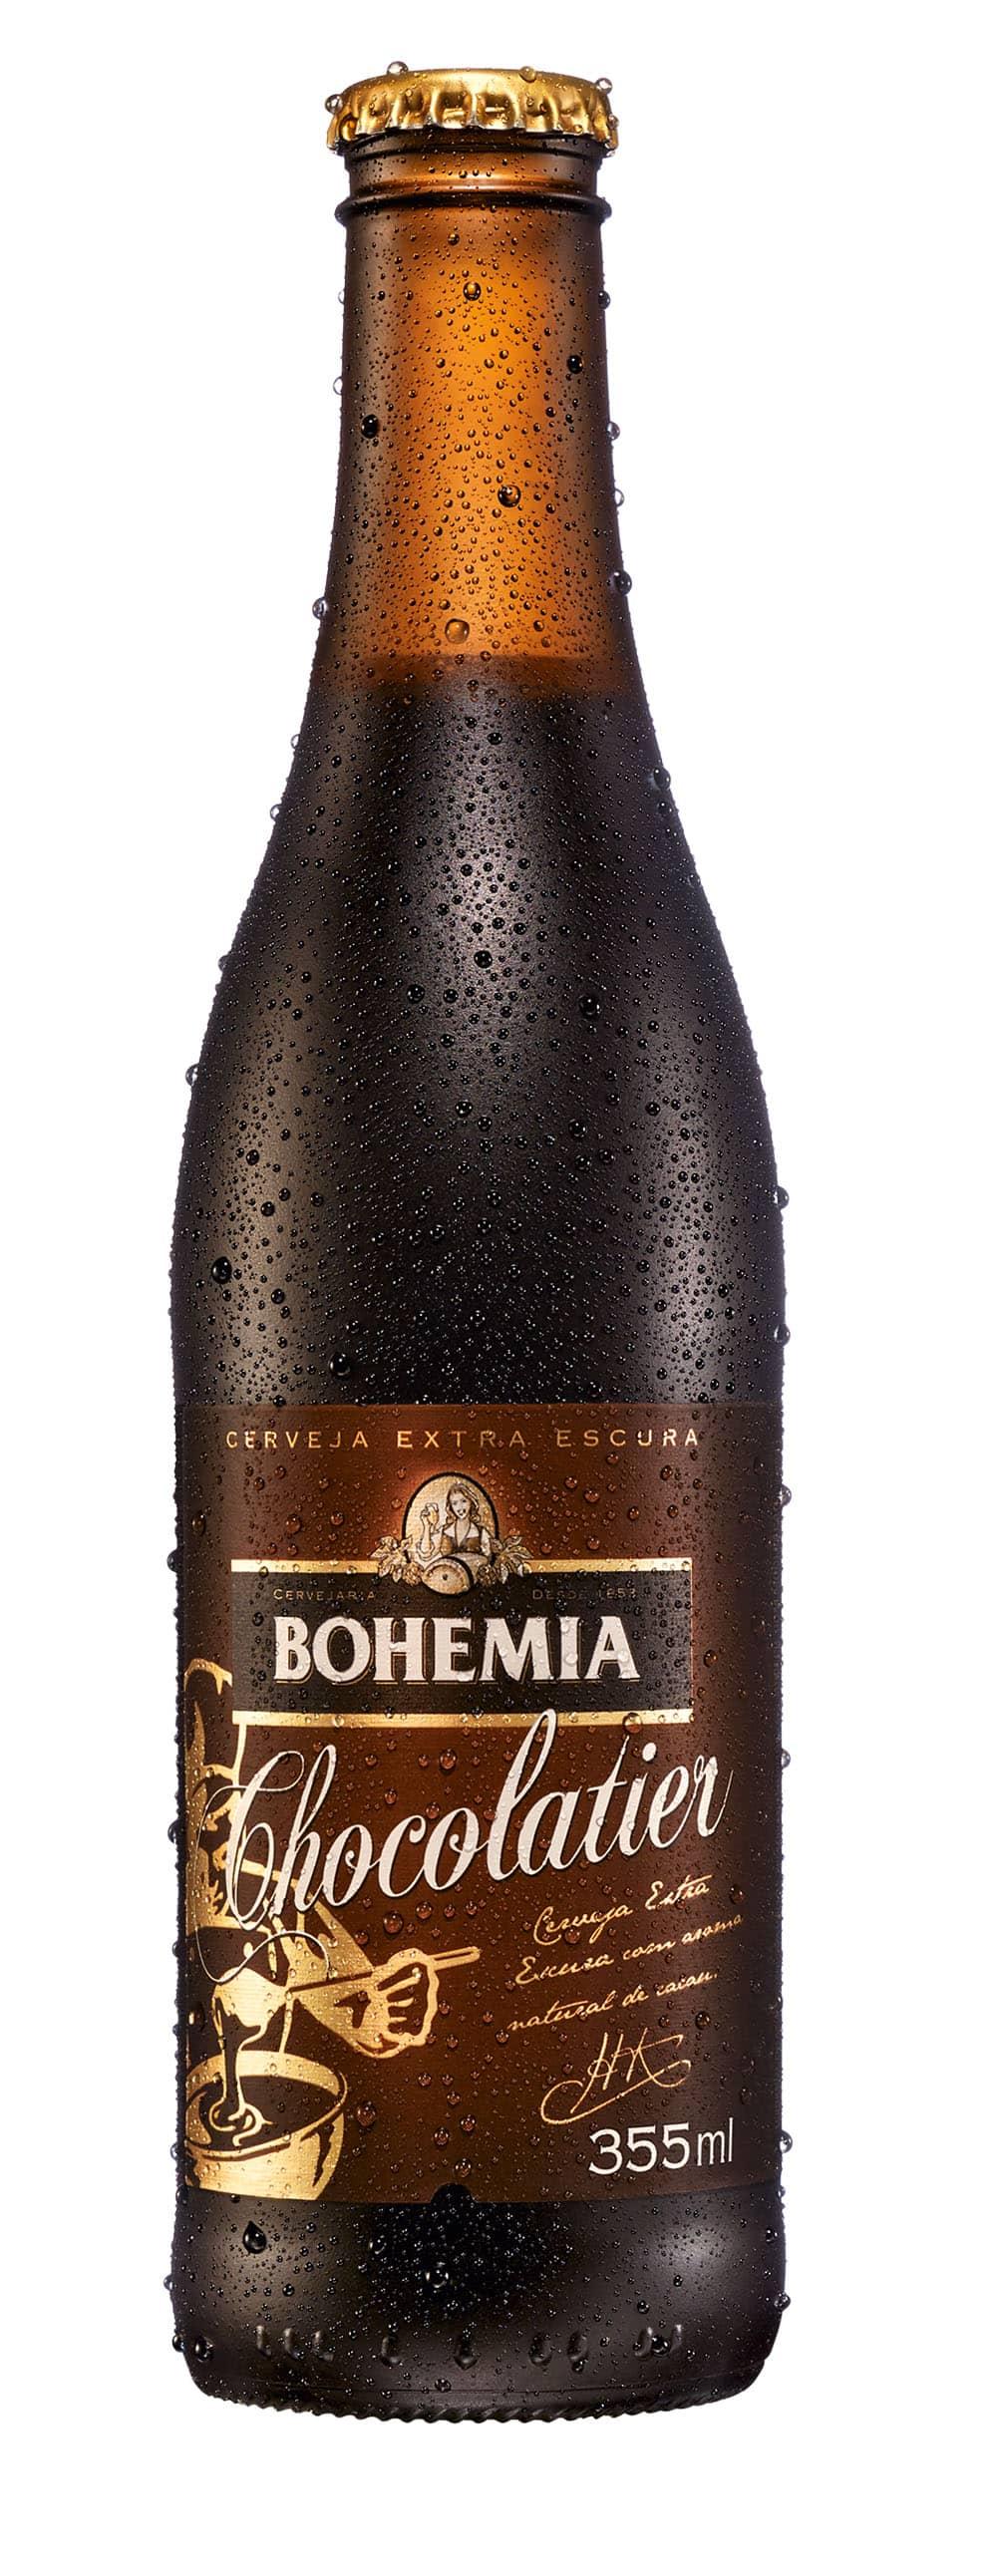 Bohemia-Chocolatier_baixa